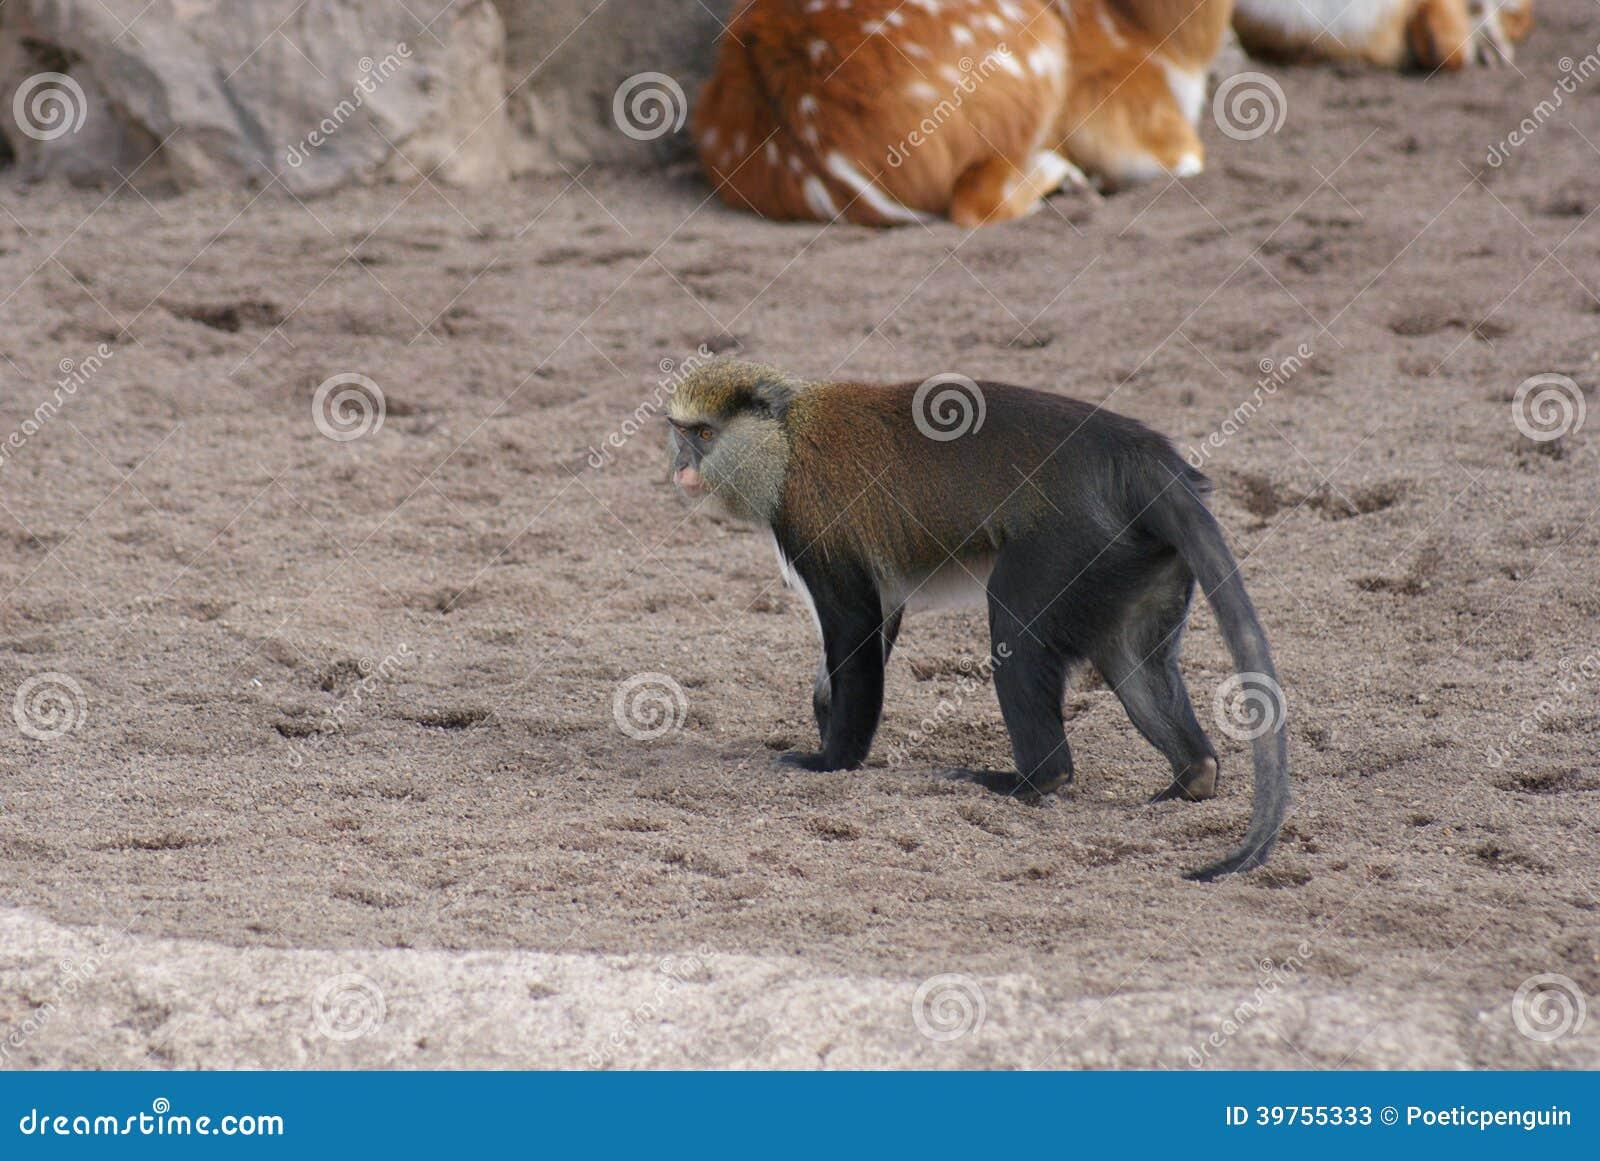 Mona małpa - Cercopithecus Mona